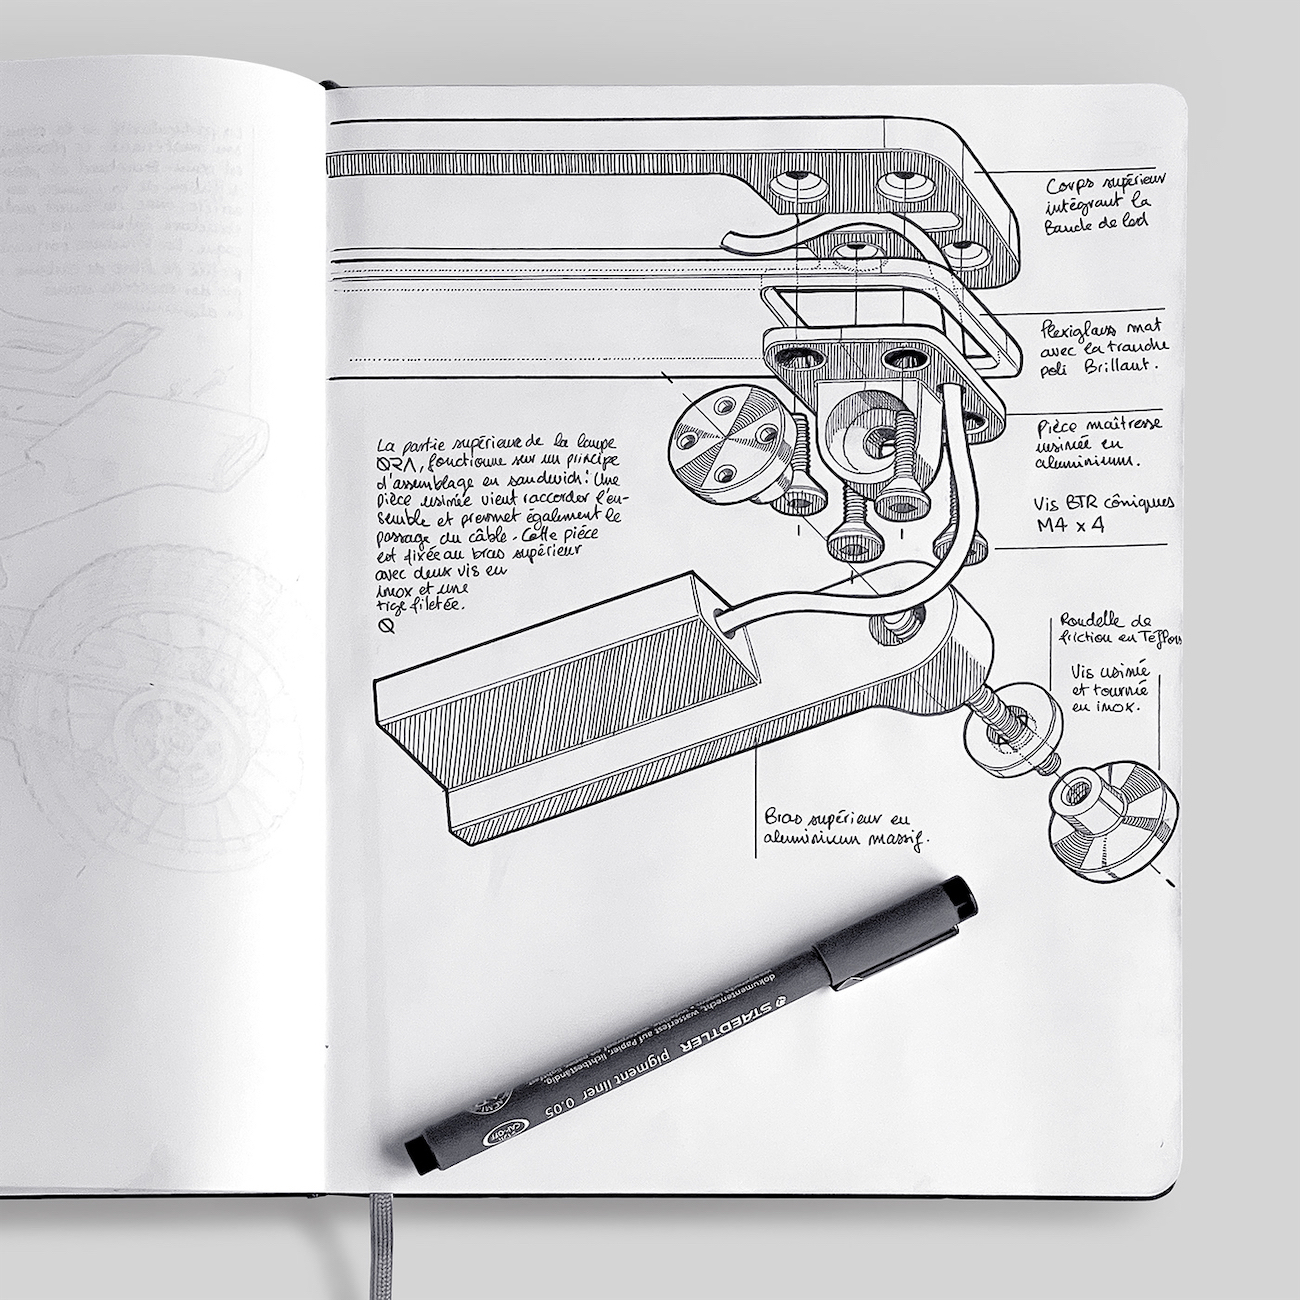 ORA Gaëtan Francq leManoosh industrial design blog and online courses